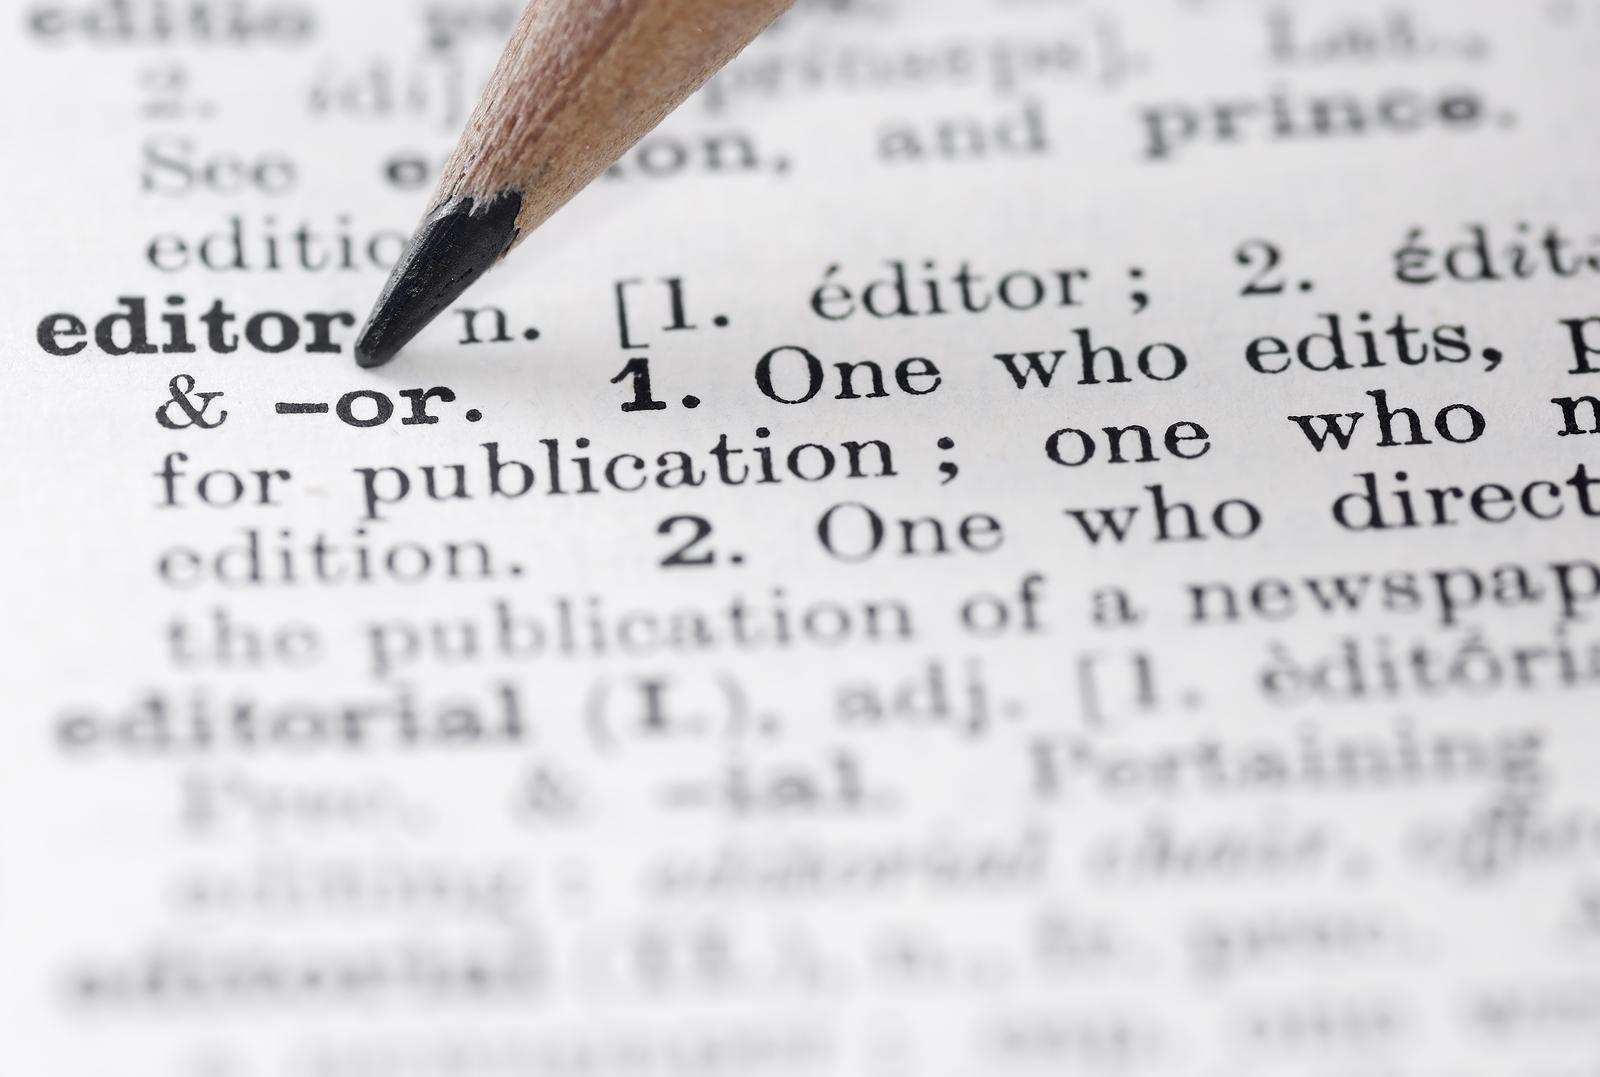 bigstock-Editor-Definition-In-English-D-28438271.jpg